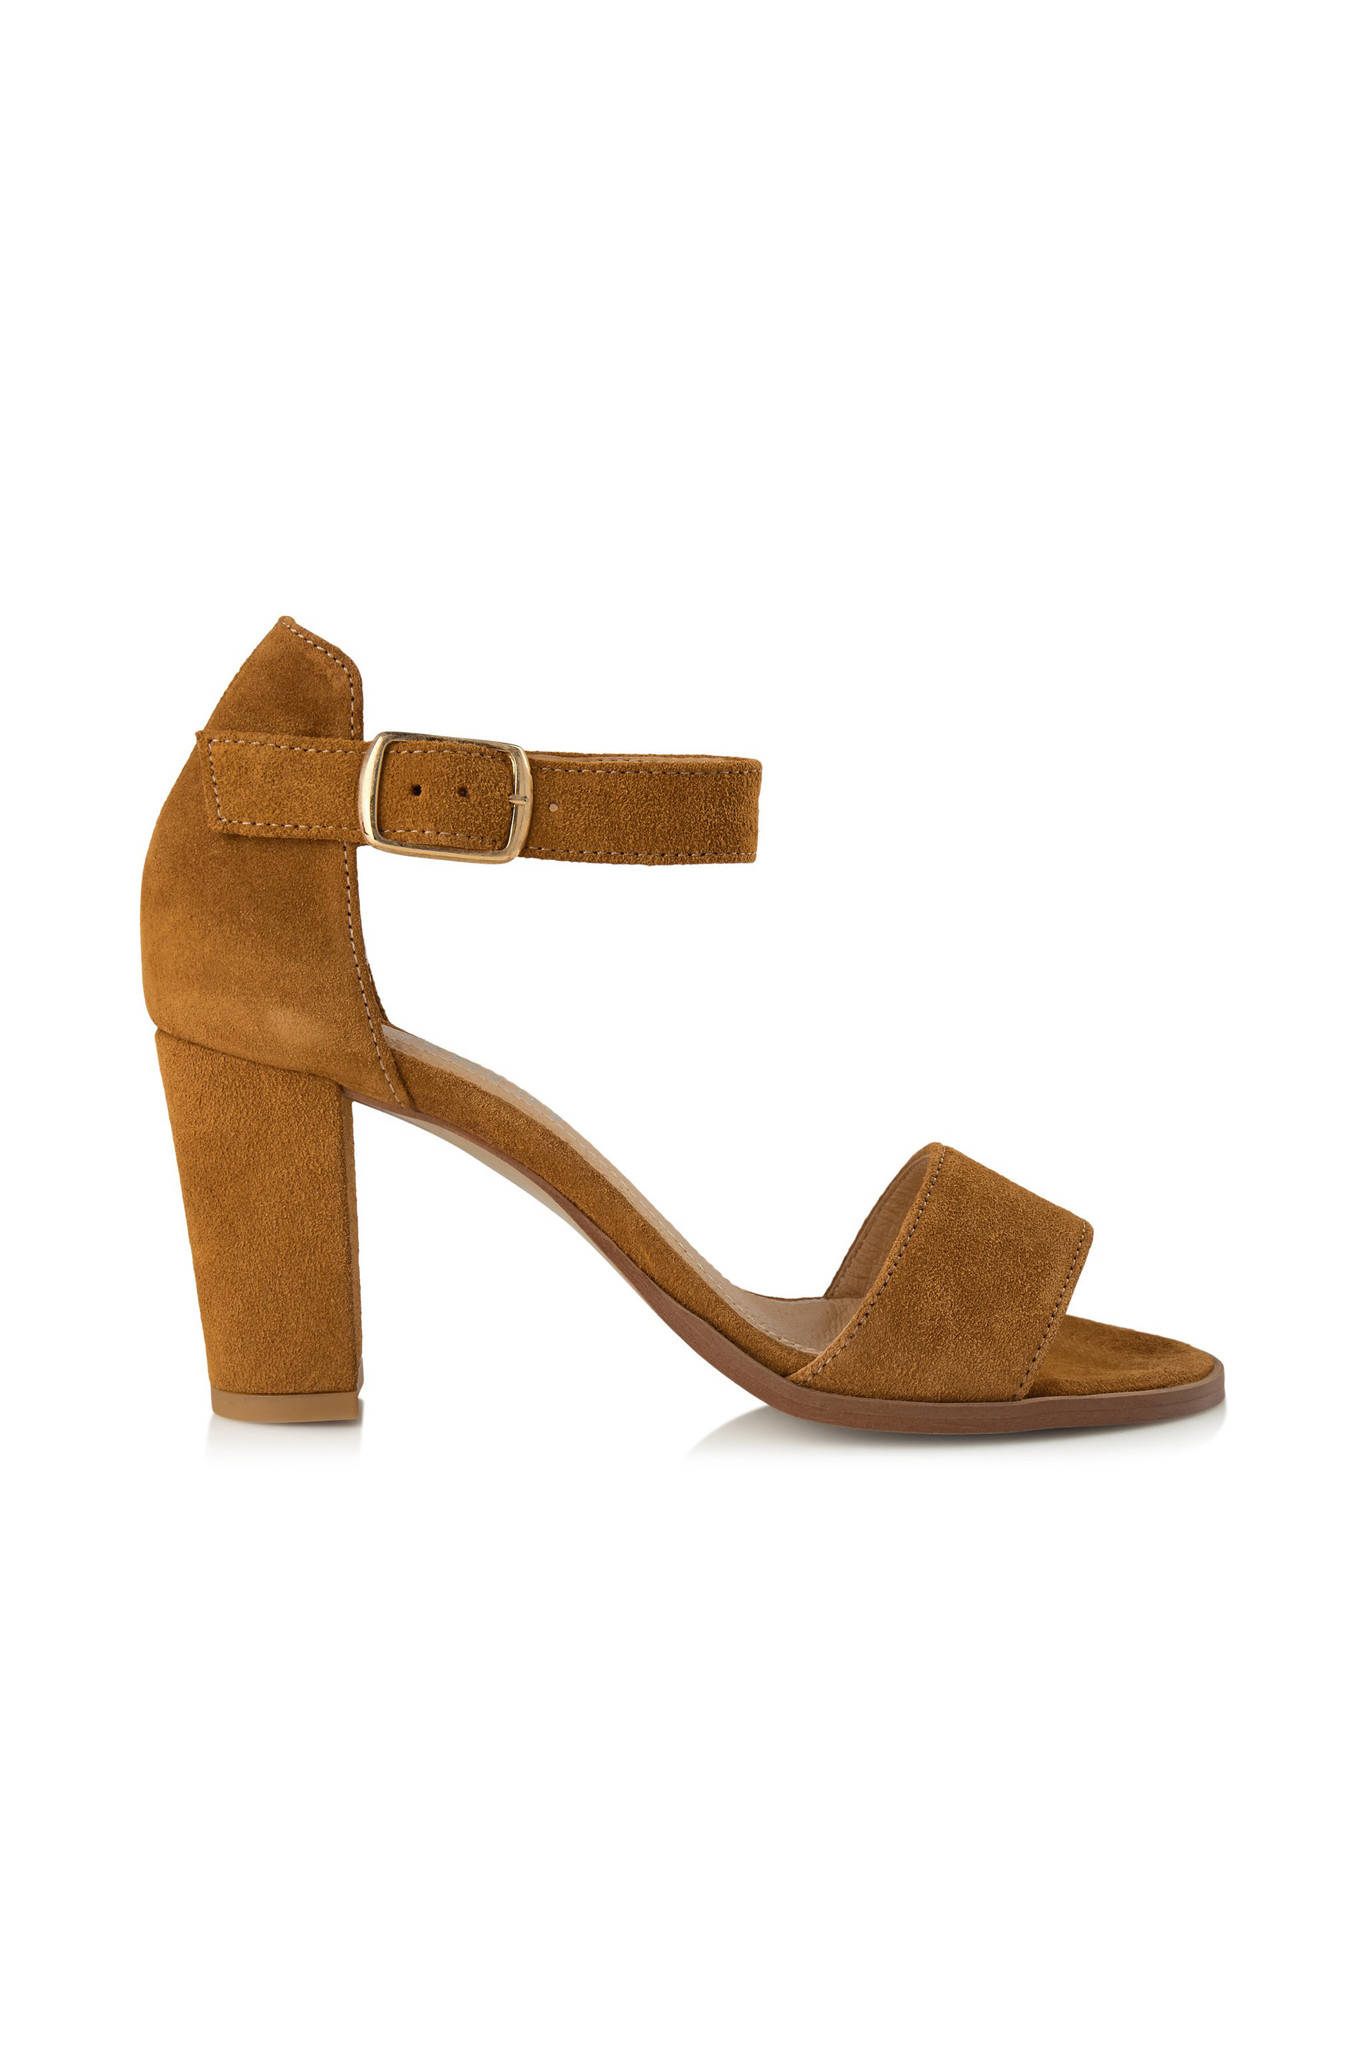 Silke Sandal - Tan Suede-1